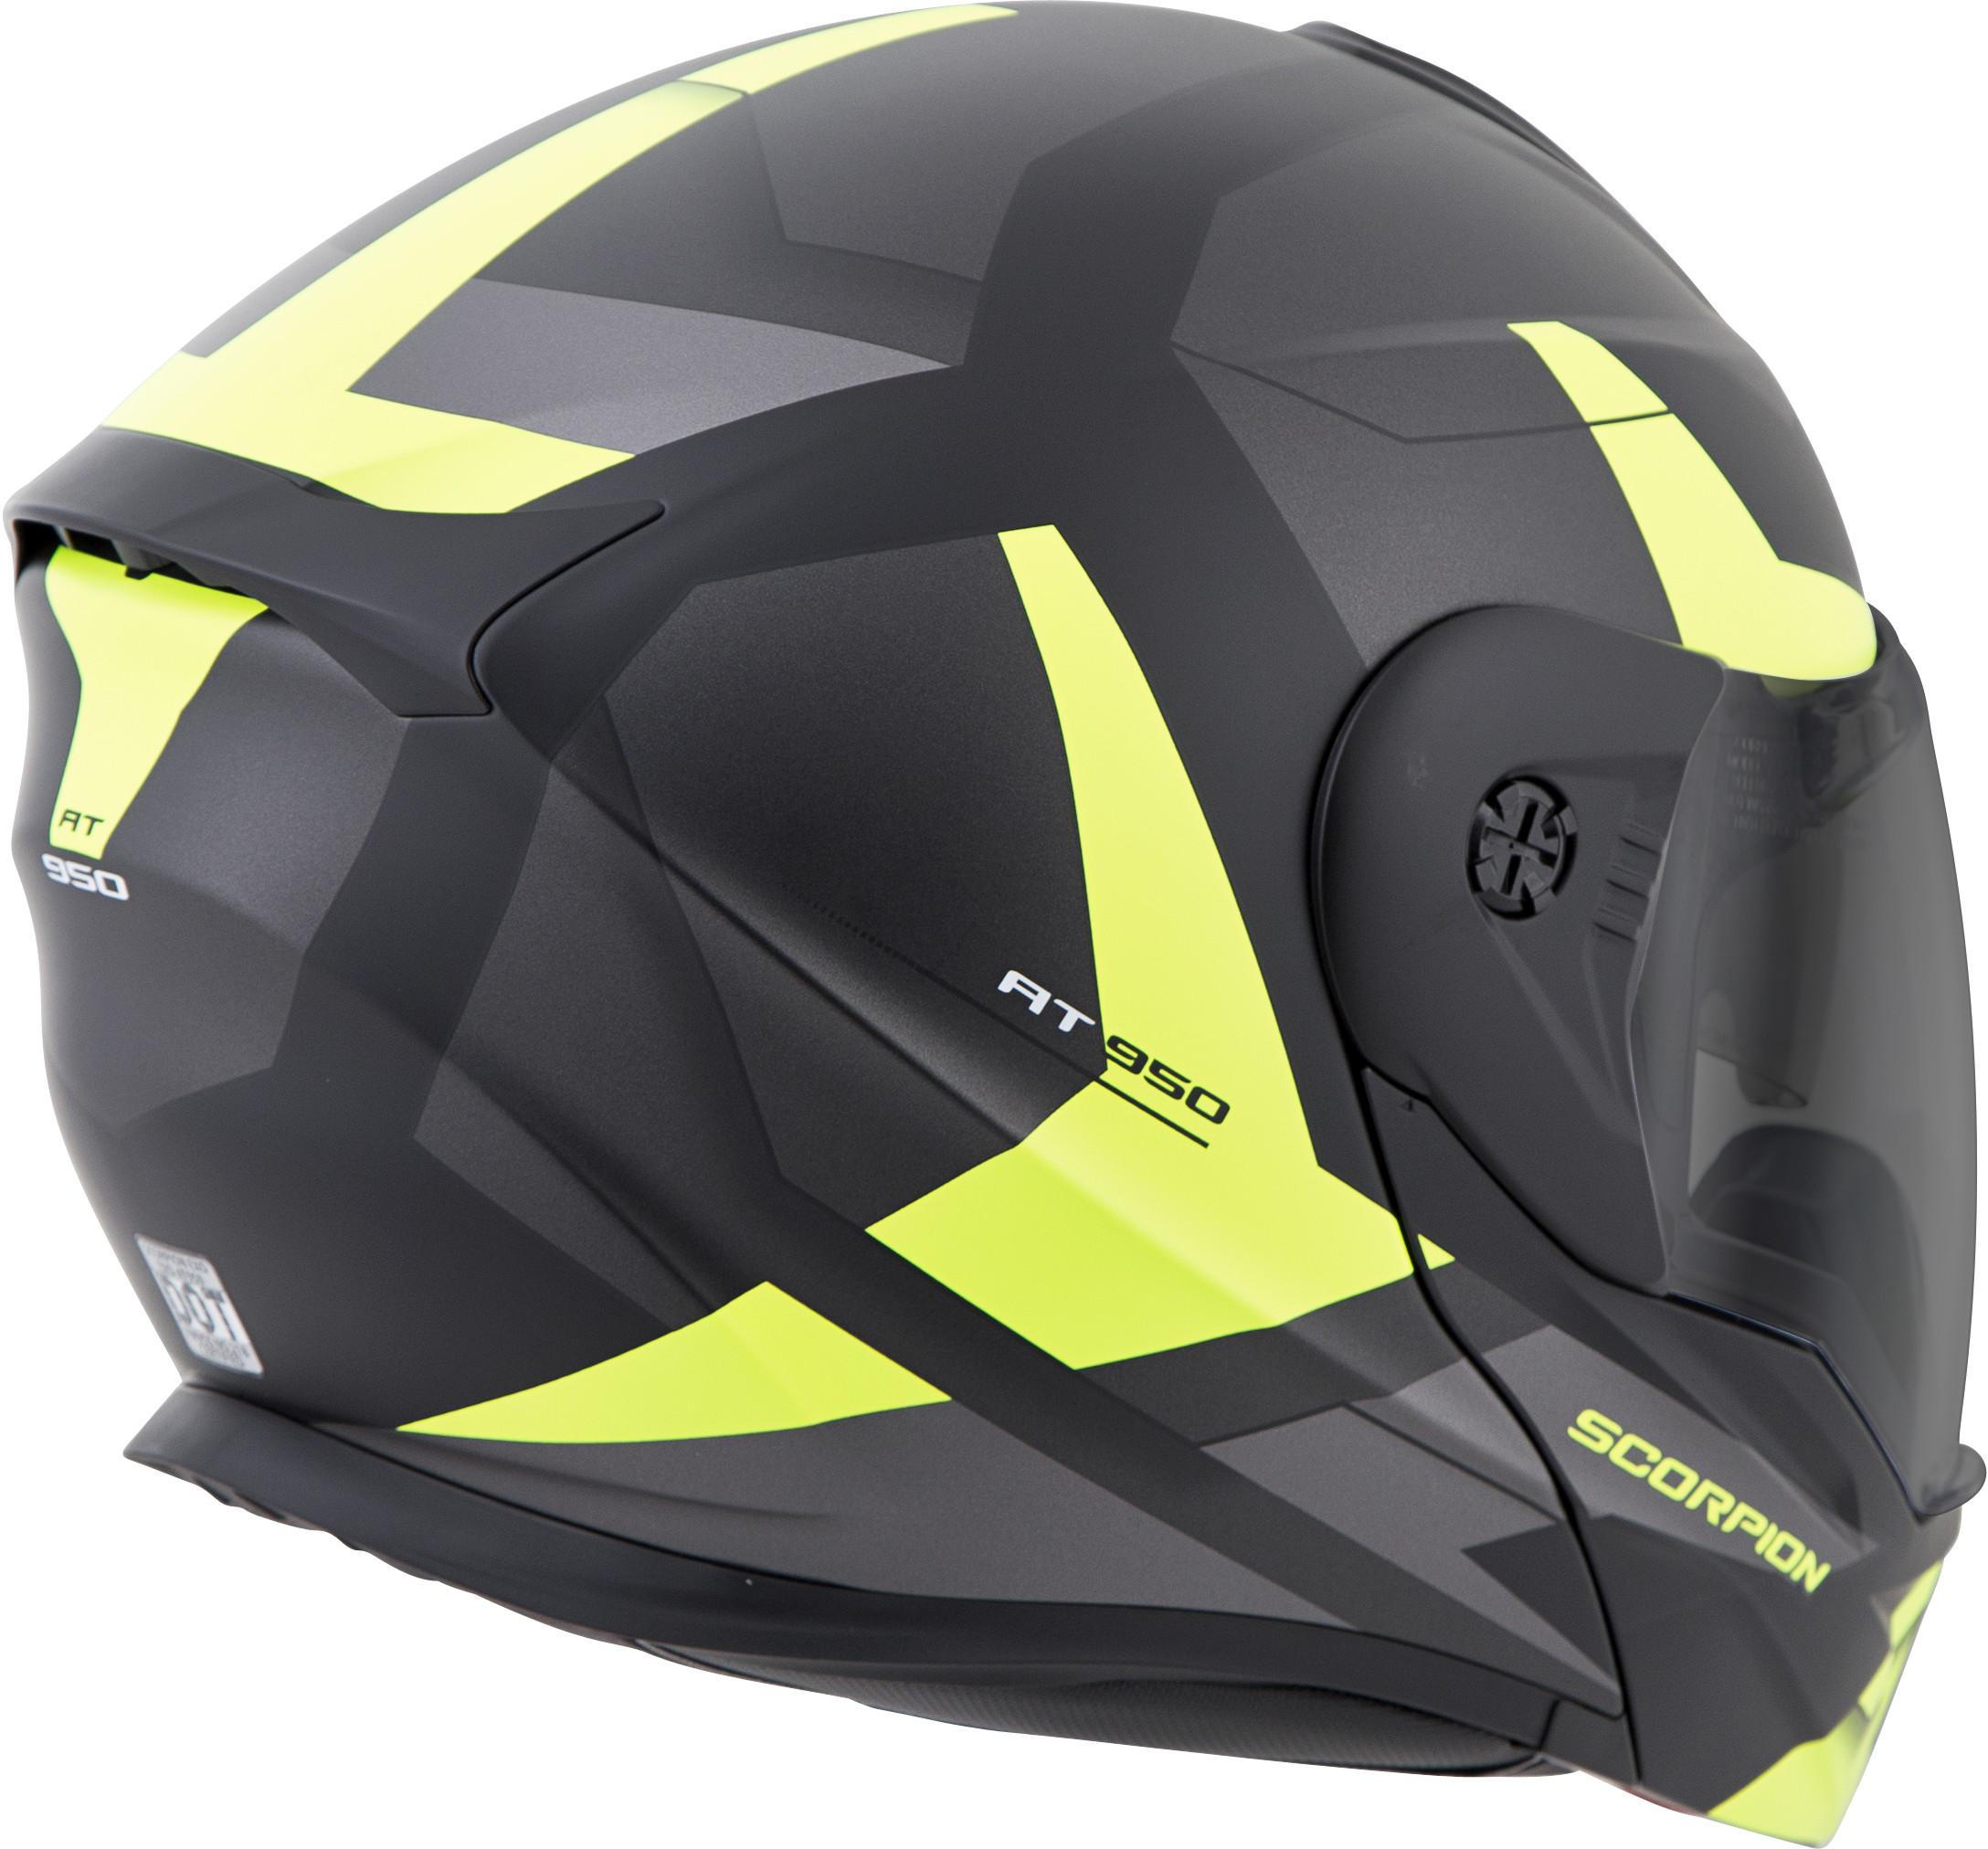 for-Scorpion-Helmet-EXO-AT950-Neocon-Snow-Helmet-with-Dual-Lens-Shield miniature 42